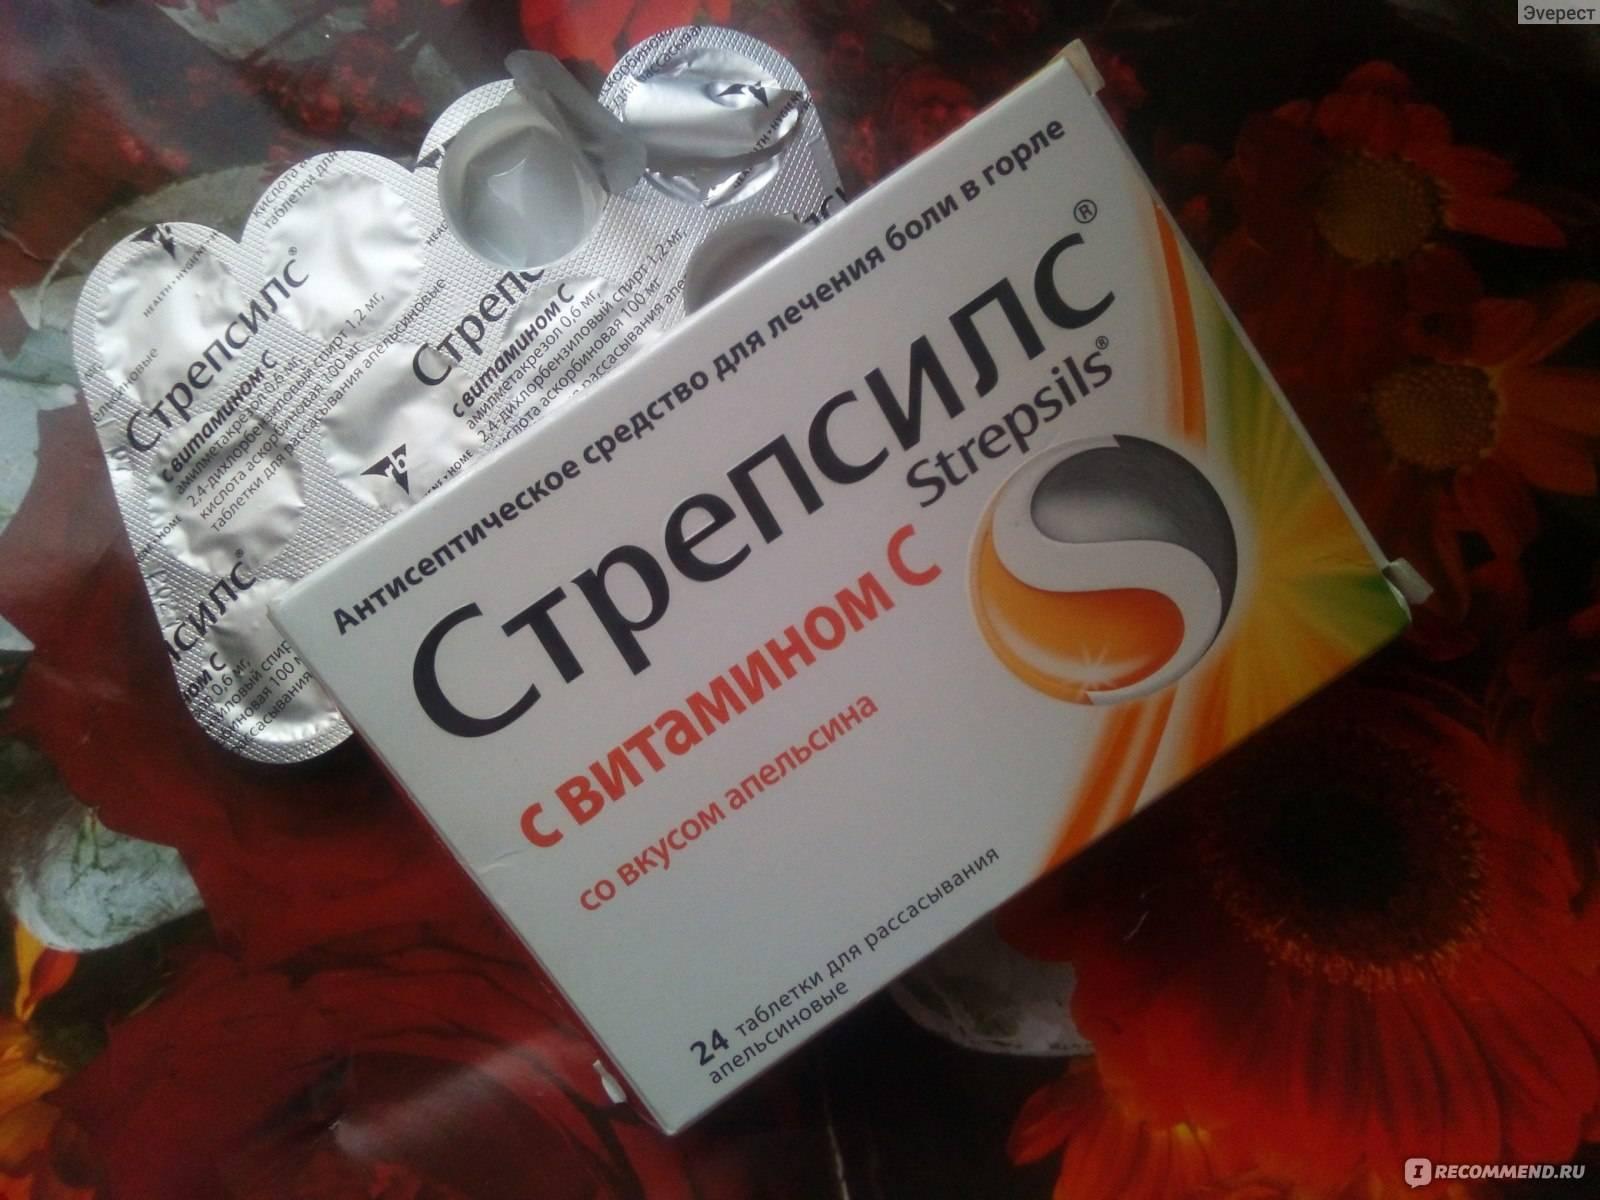 Таблетки от горла: разновидности и особенности применения